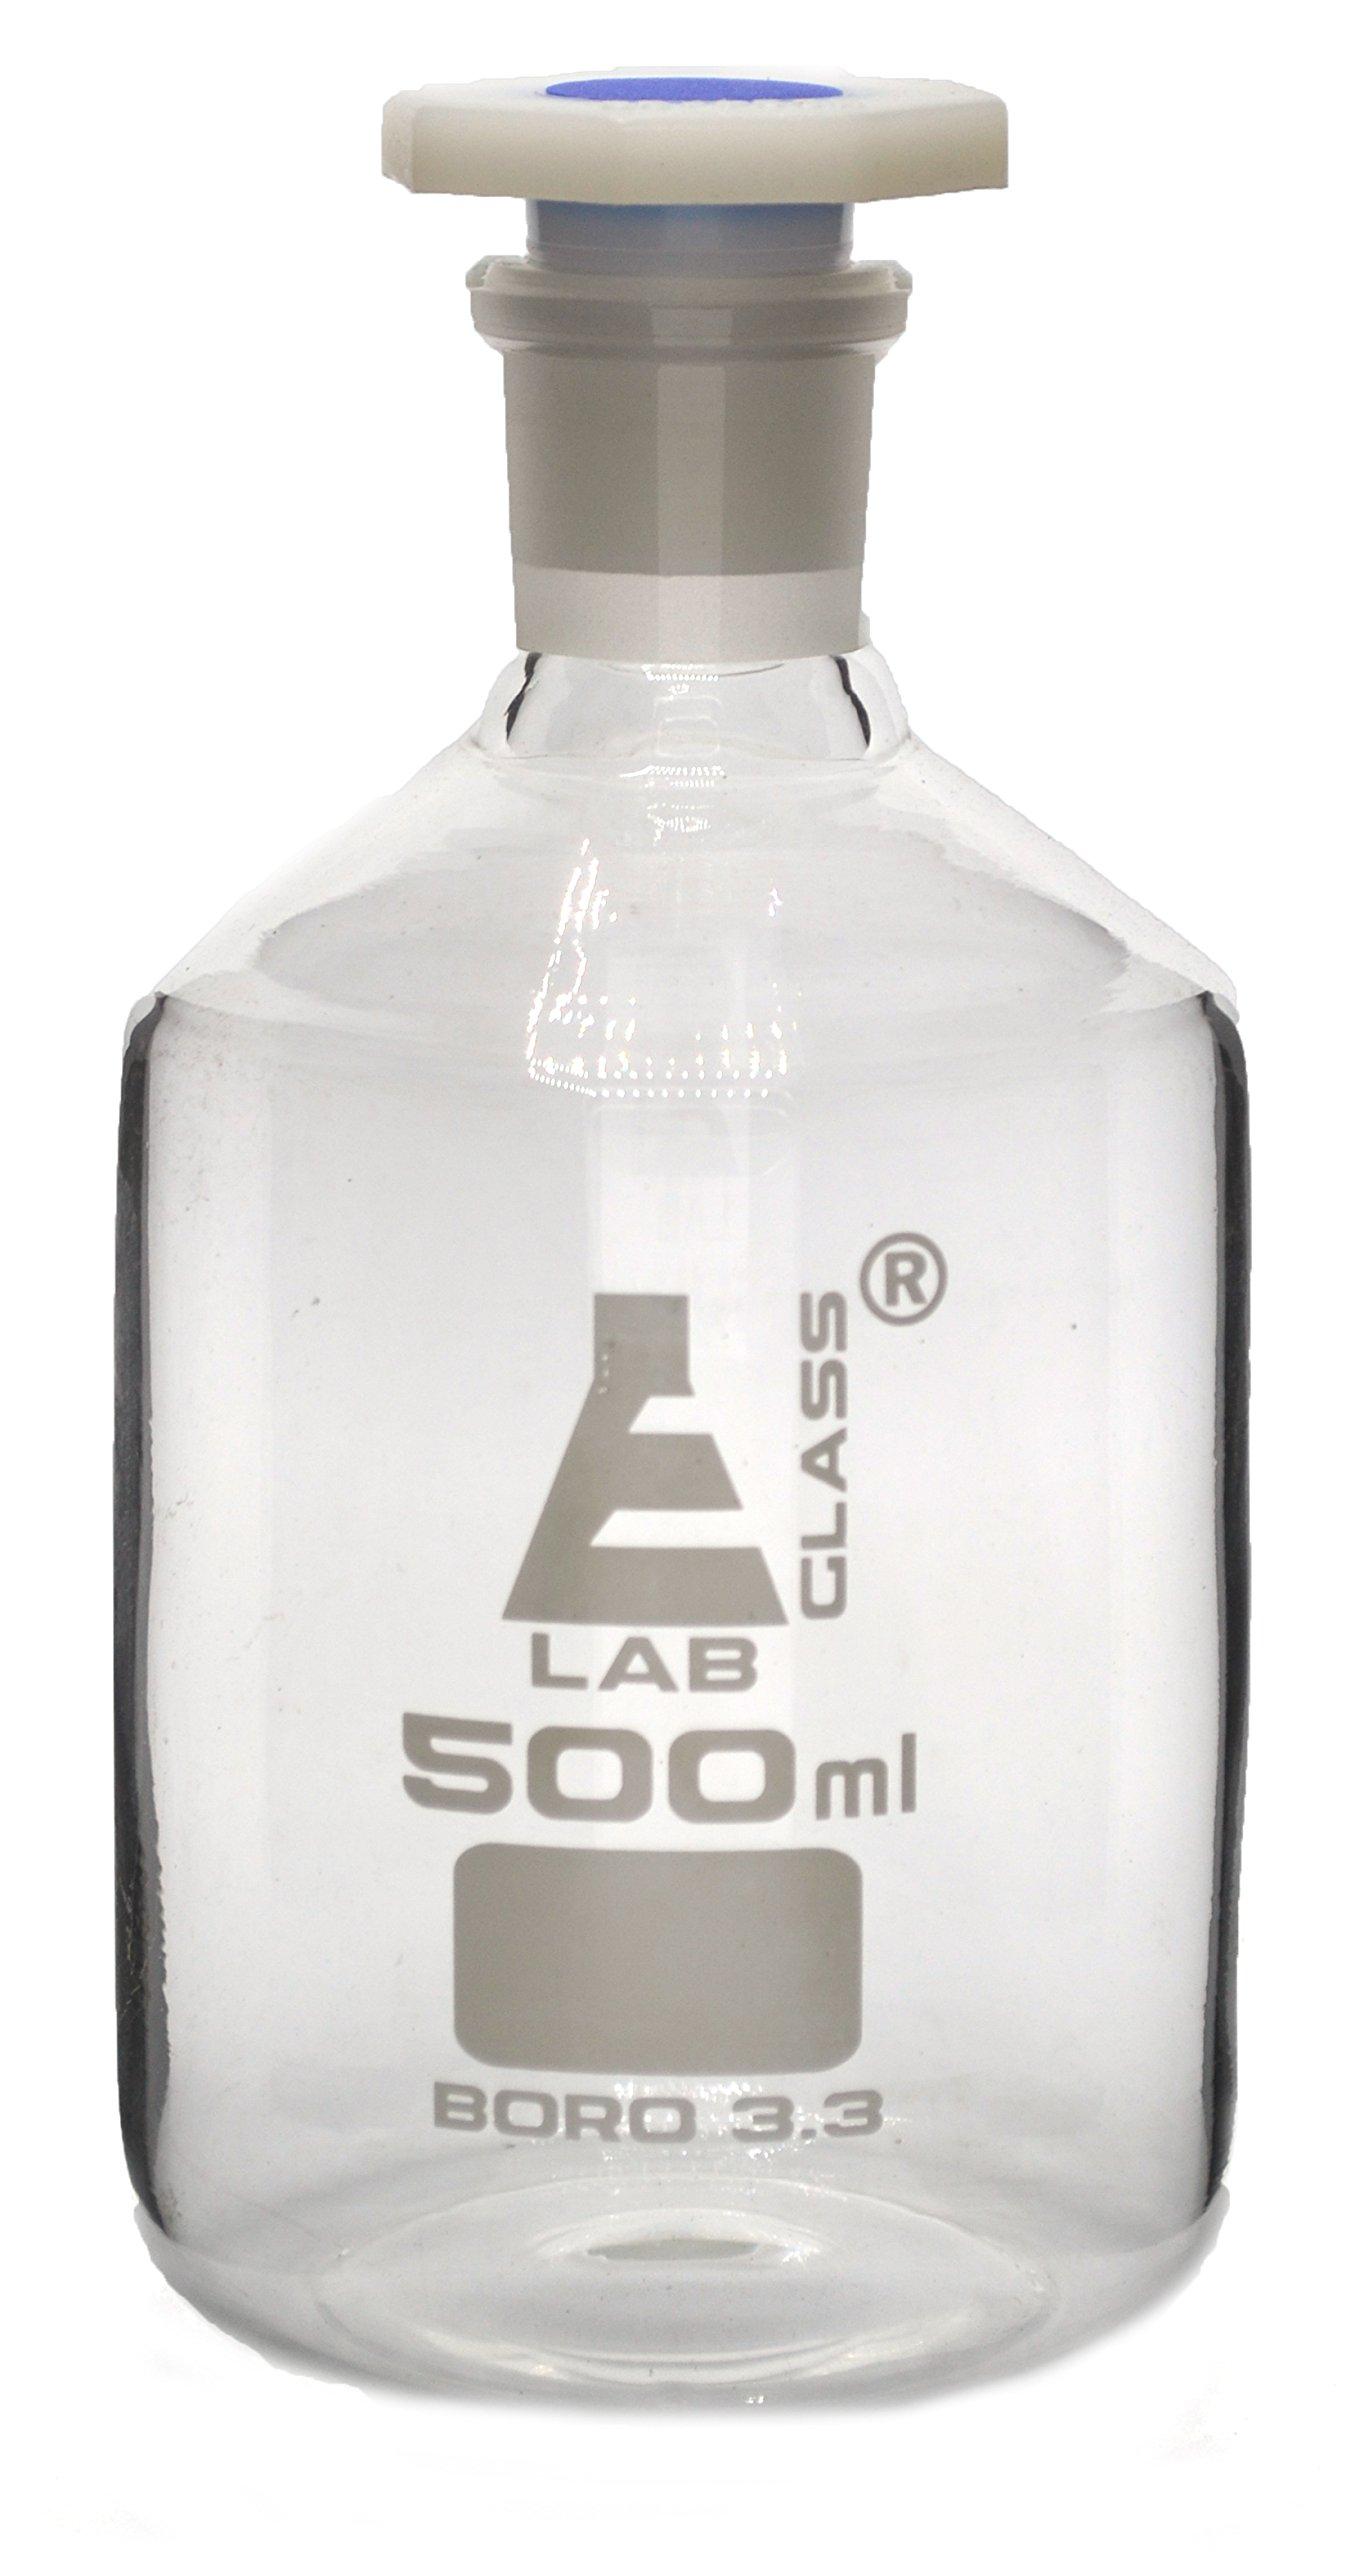 500mL (16.9oz) Glass Reagent Bottle with Acid Proof Polypropylene Stopper, Borosilicate 3.3 Glass - Eisco Labs